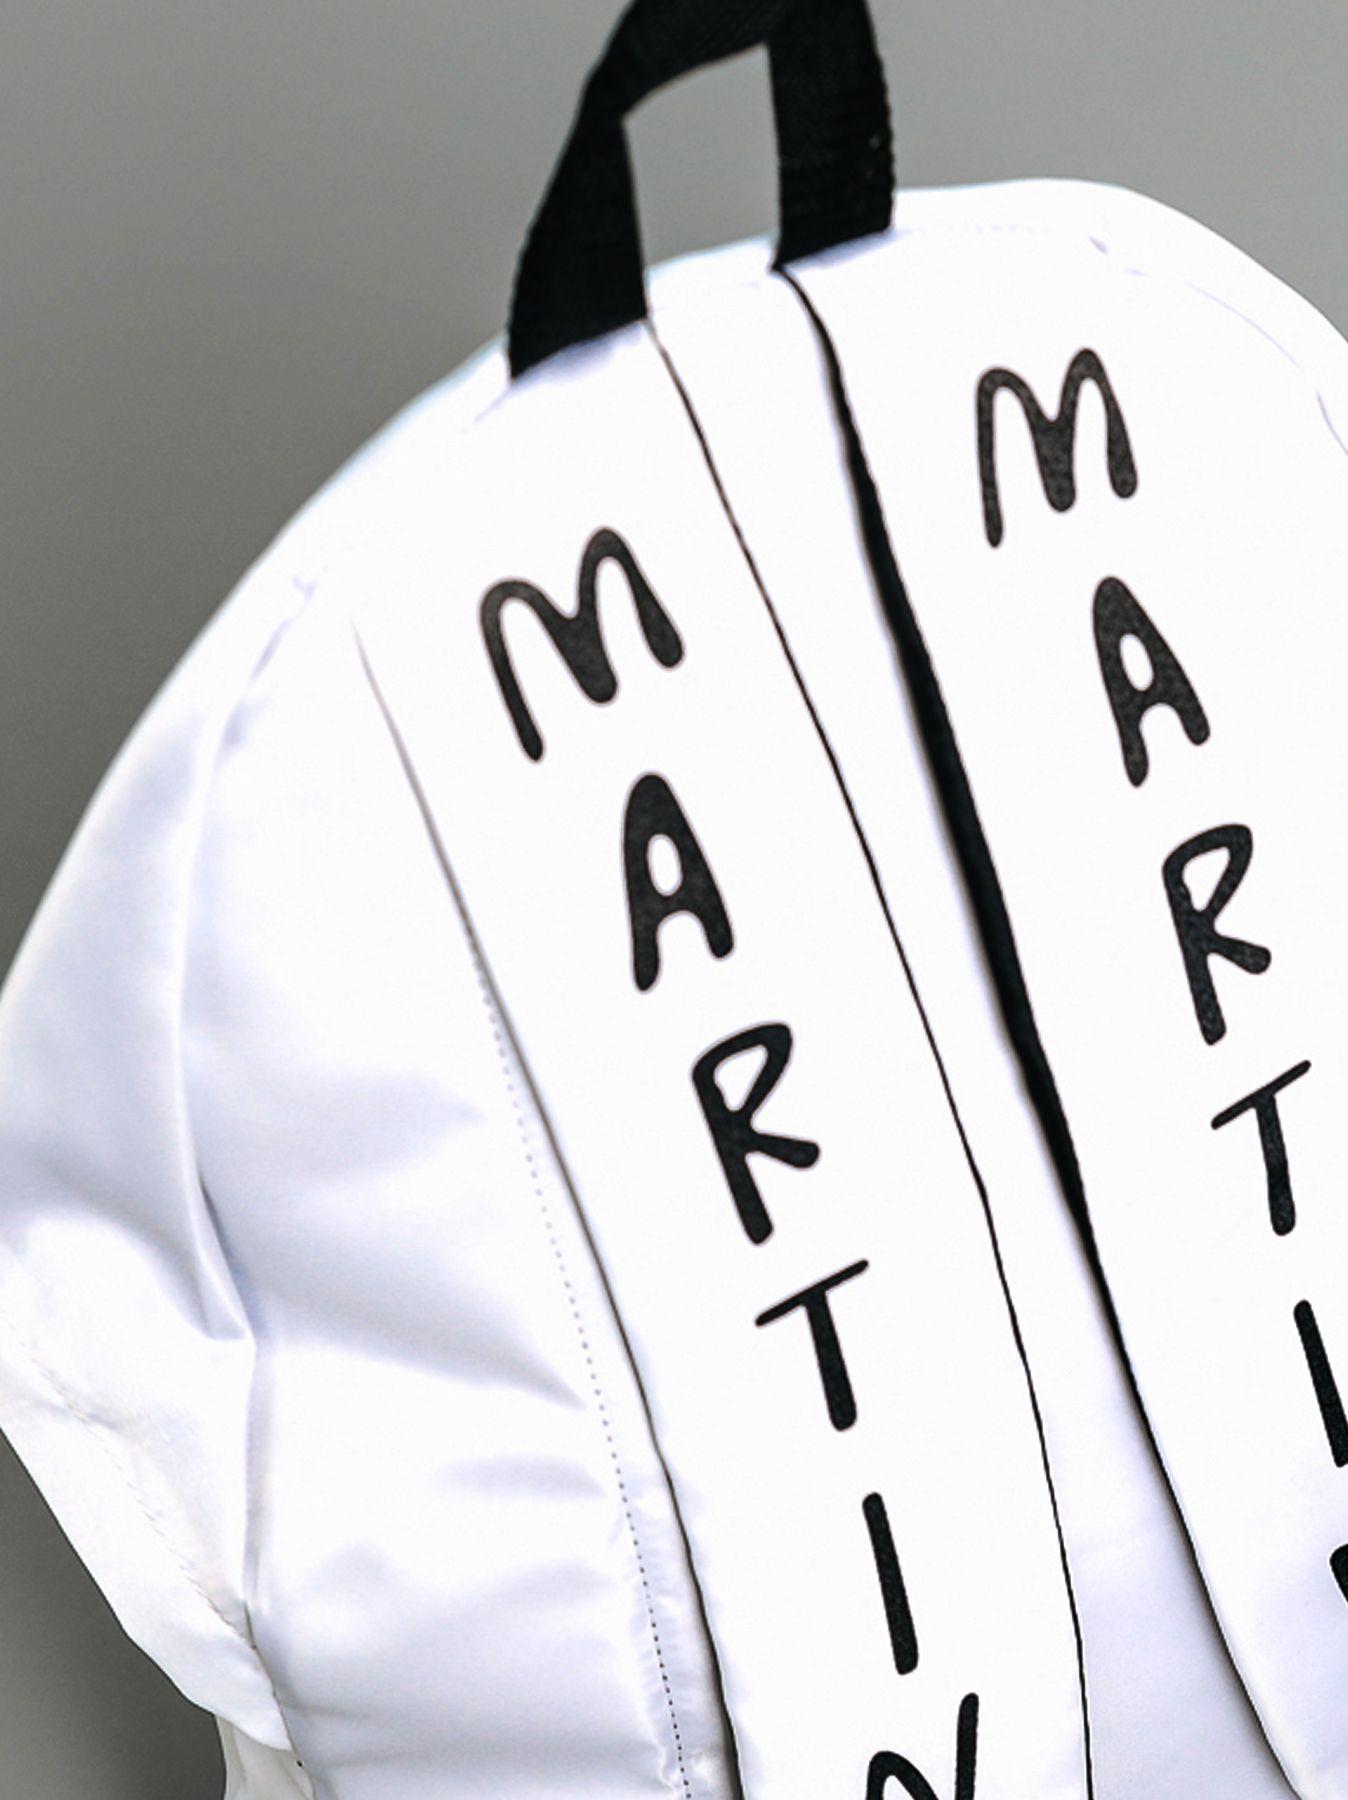 Zainetto #MARTINO #ONTHEROAD